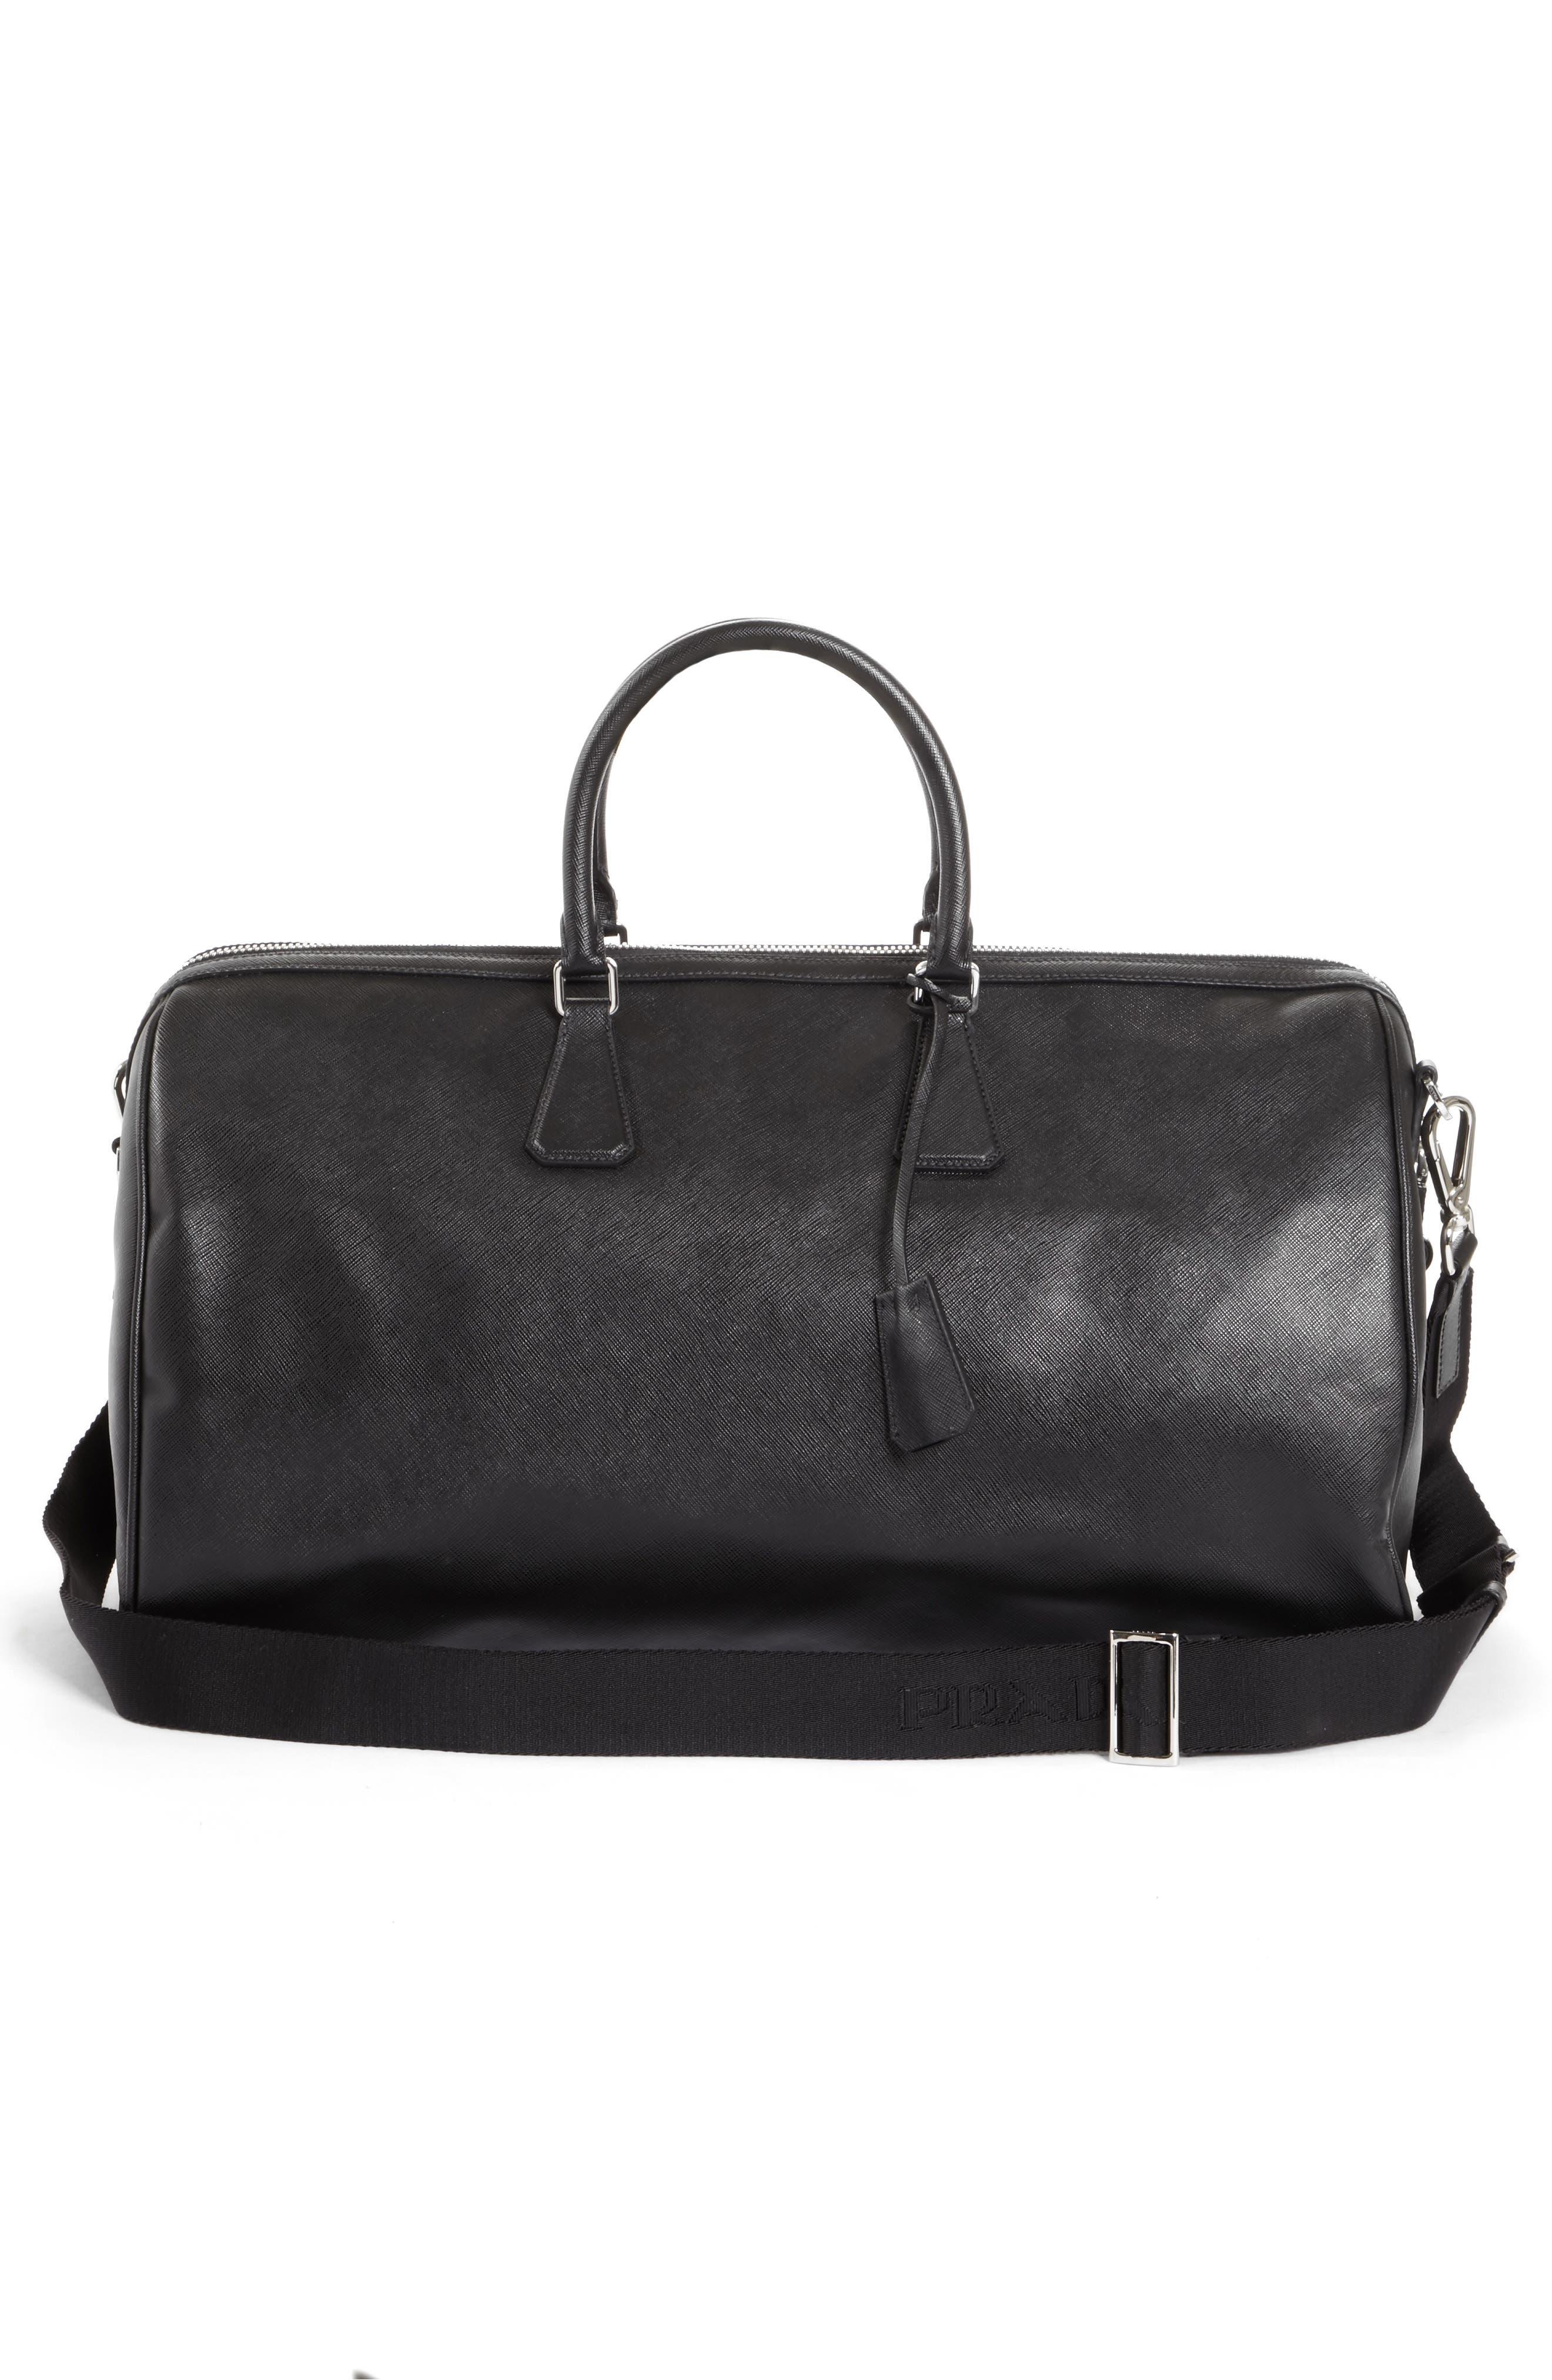 Saffiano Leather Duffel Bag,                             Alternate thumbnail 3, color,                             F0002 Nero